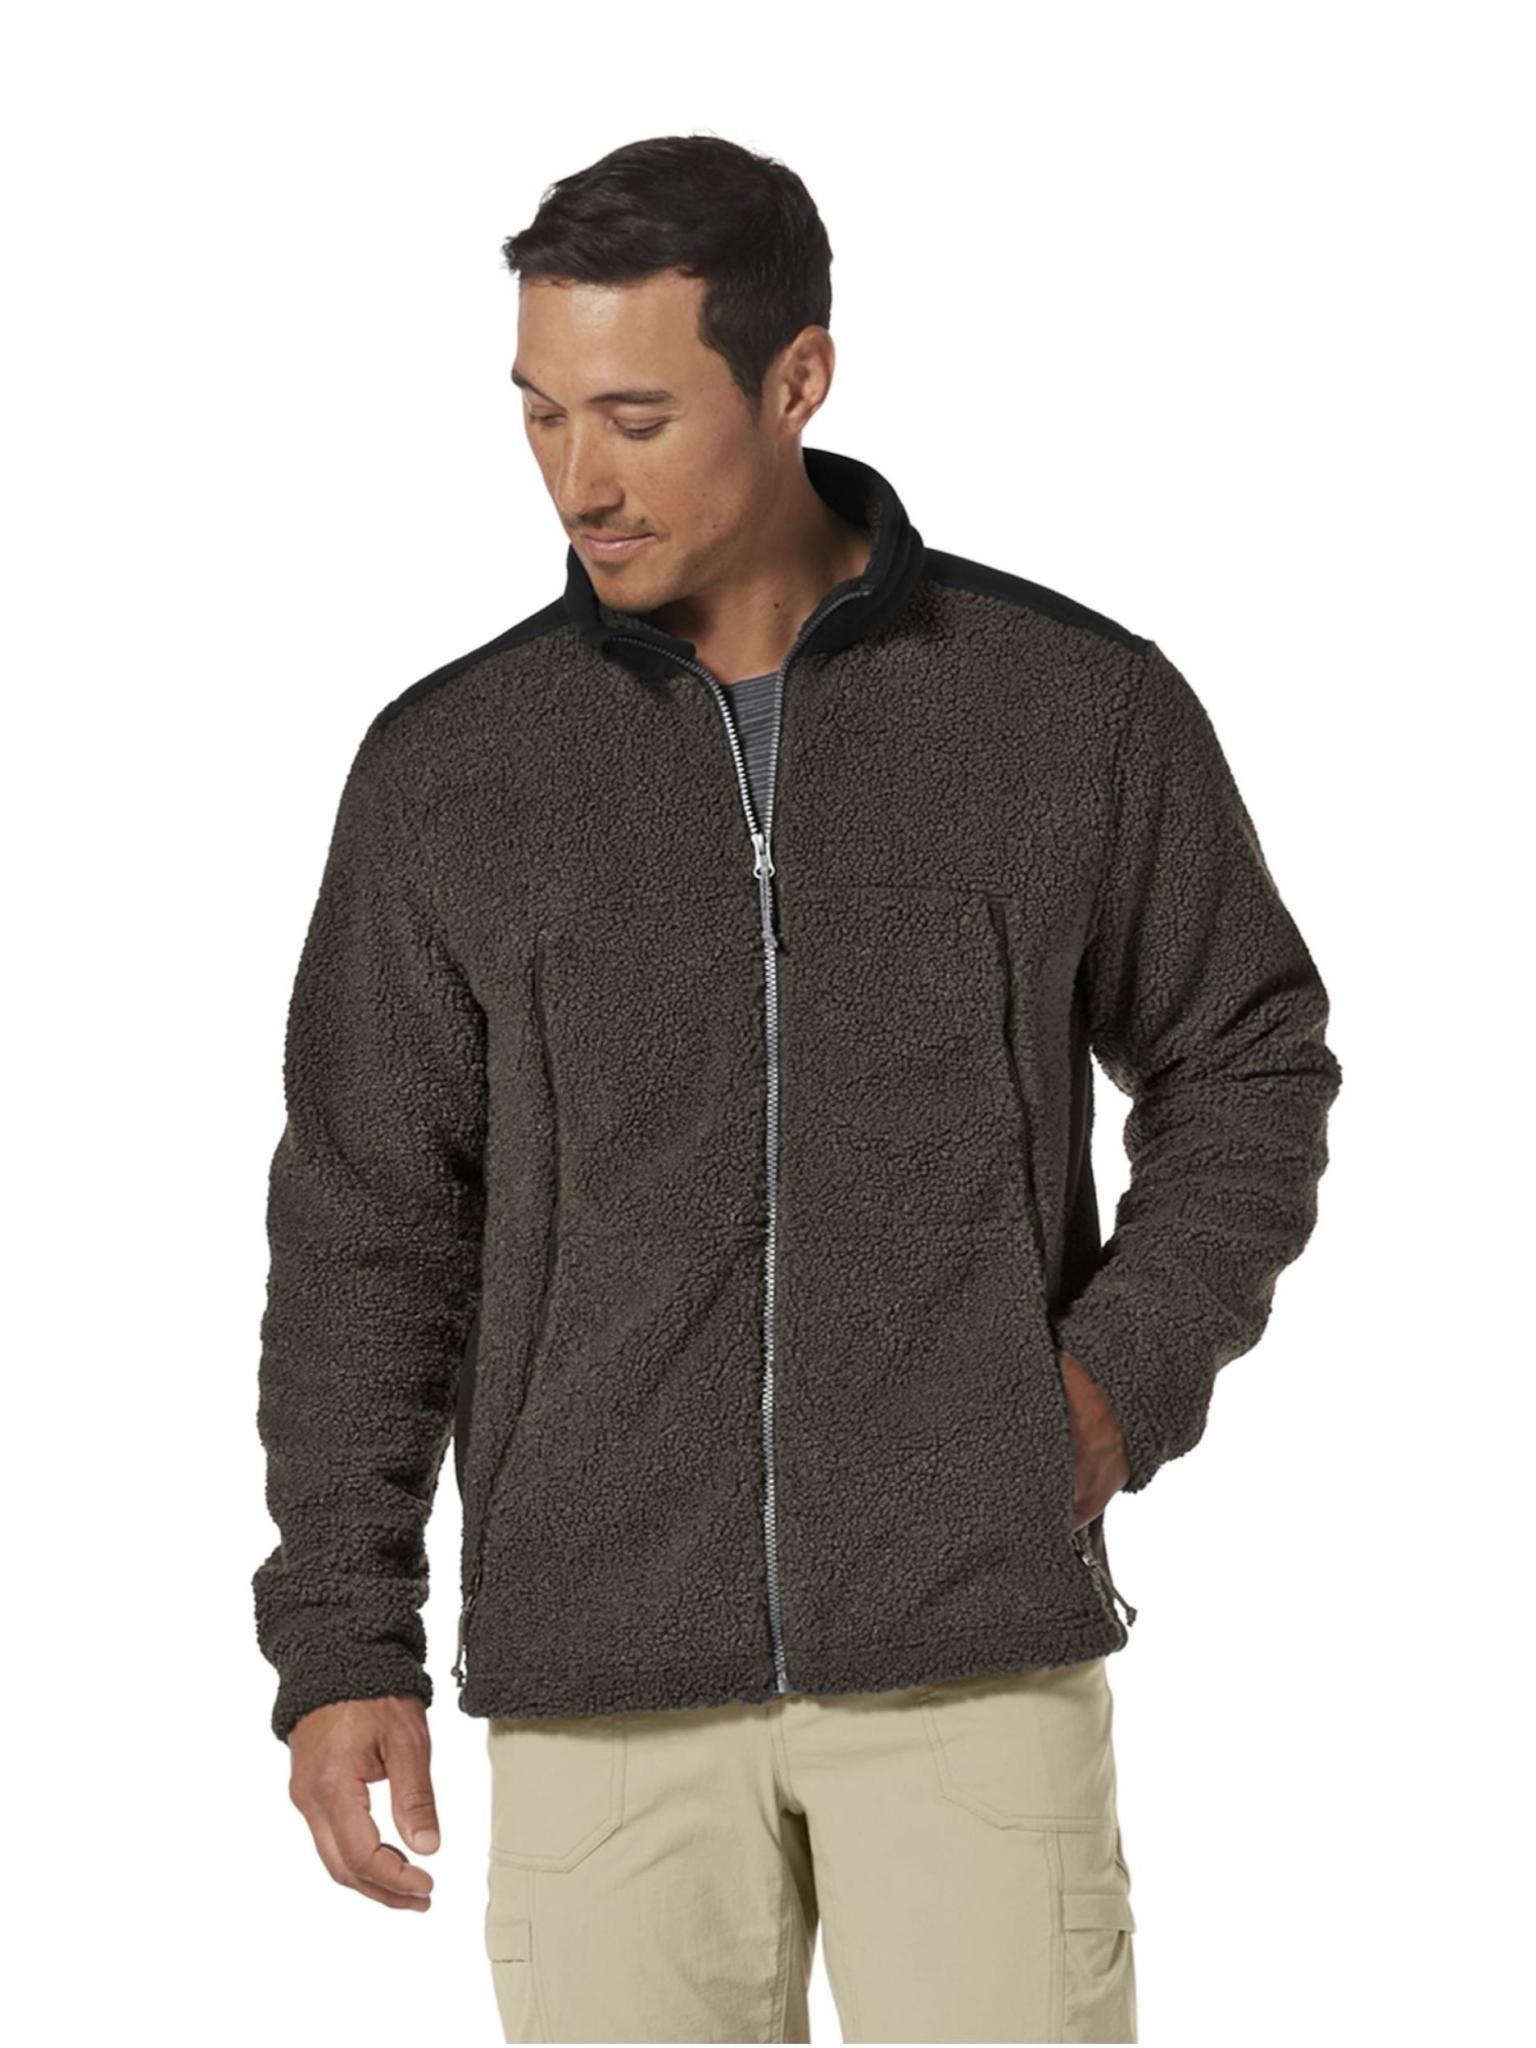 Royal Robbins Men's Outerzone Fleece Full Zip